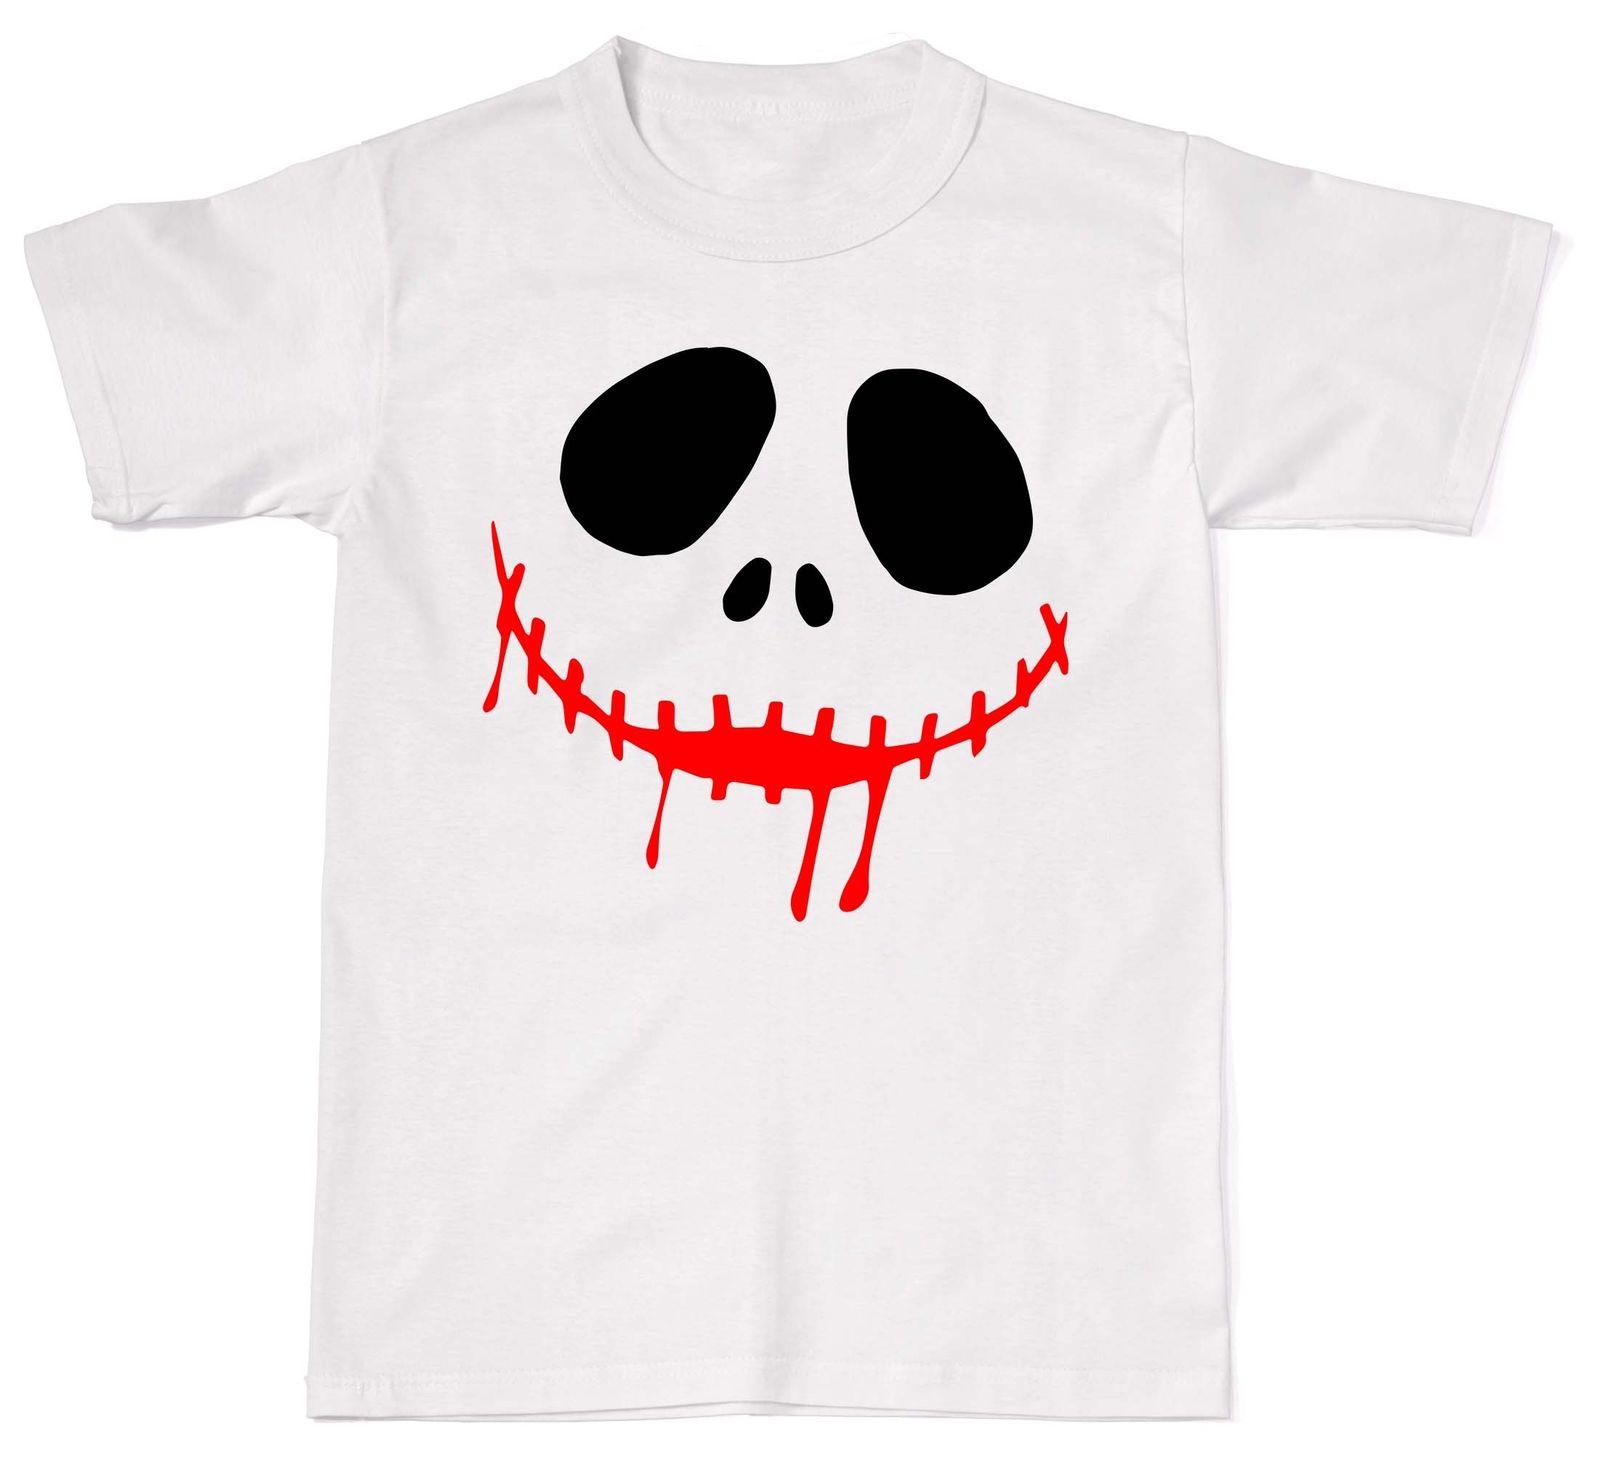 Jack Halloween Nightmare Christmas Xmas Festive Unisex T-Shirt T Shirt Cotton ...